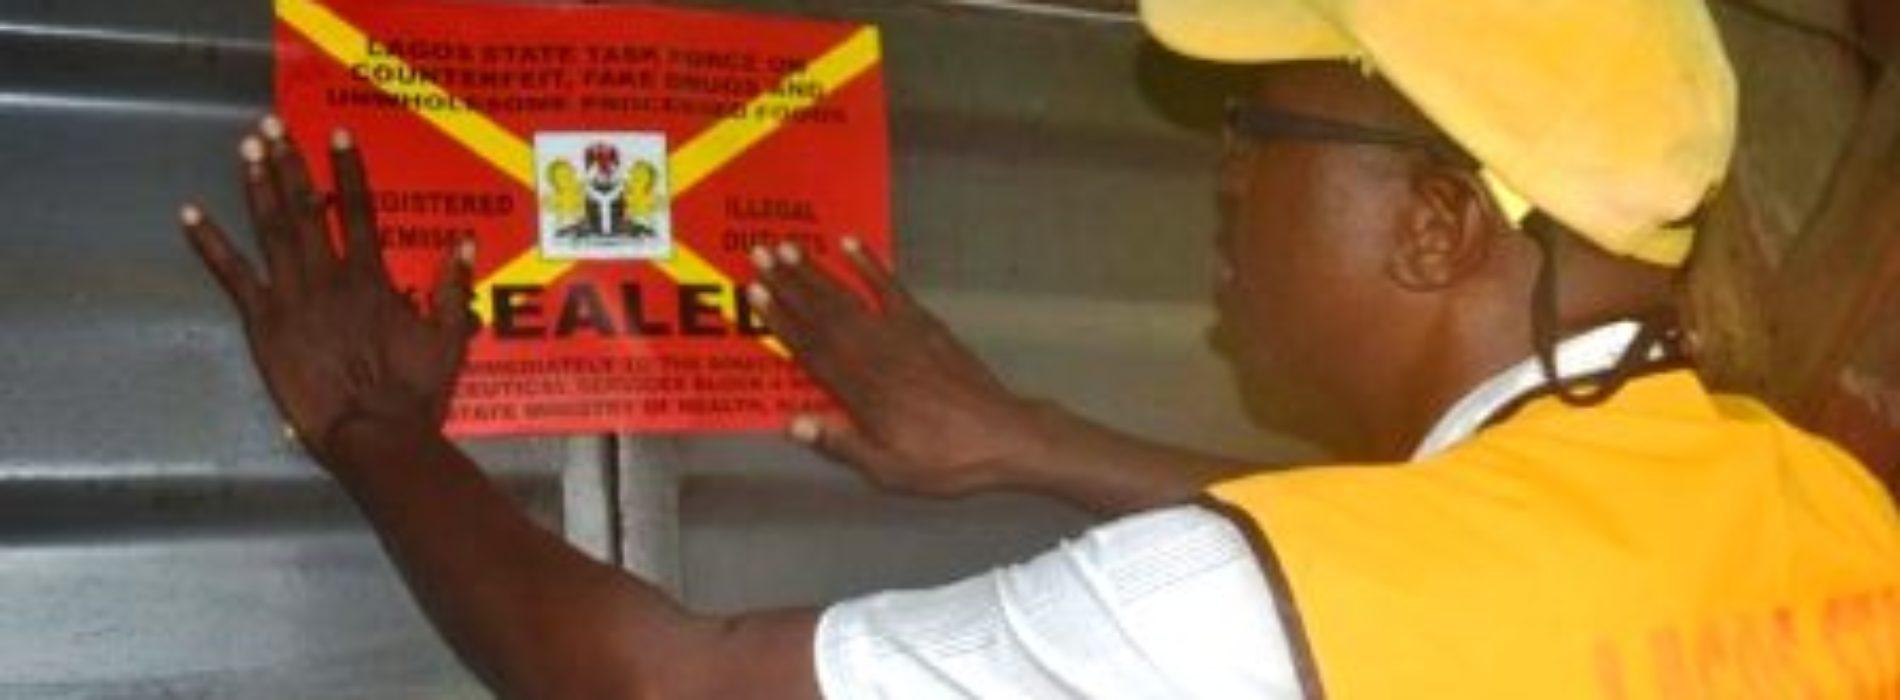 Lagos shuts 32 illegal. unregistered pharmacies and patent medicine stores